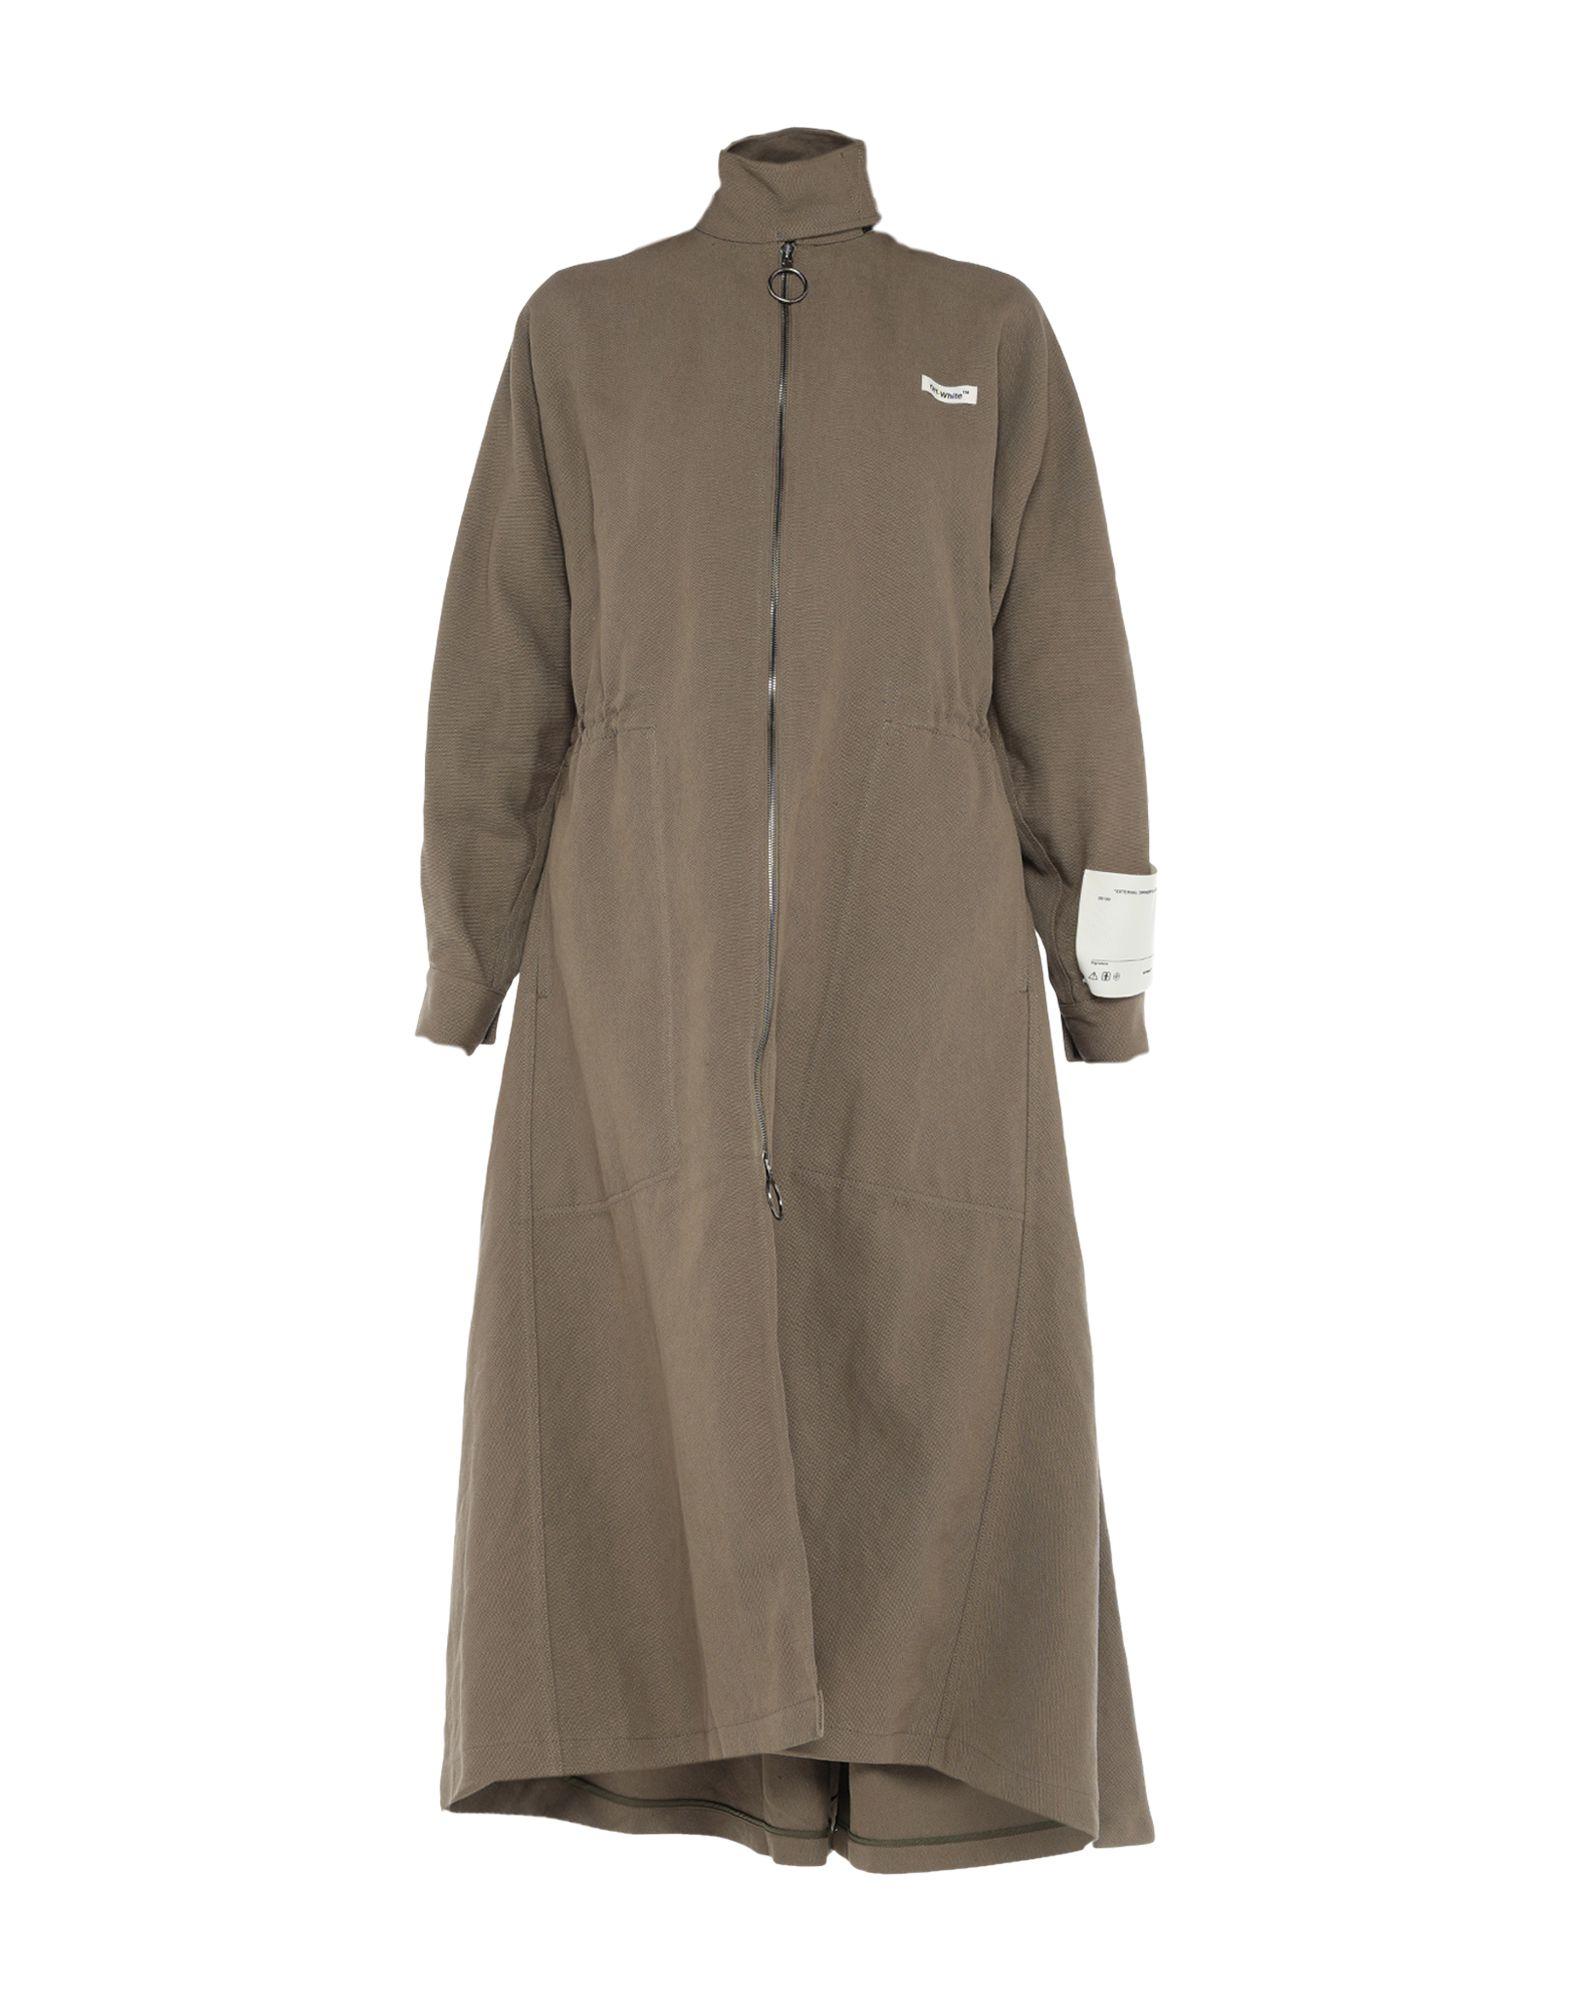 OFF-WHITE™ Легкое пальто off white™ легкое пальто